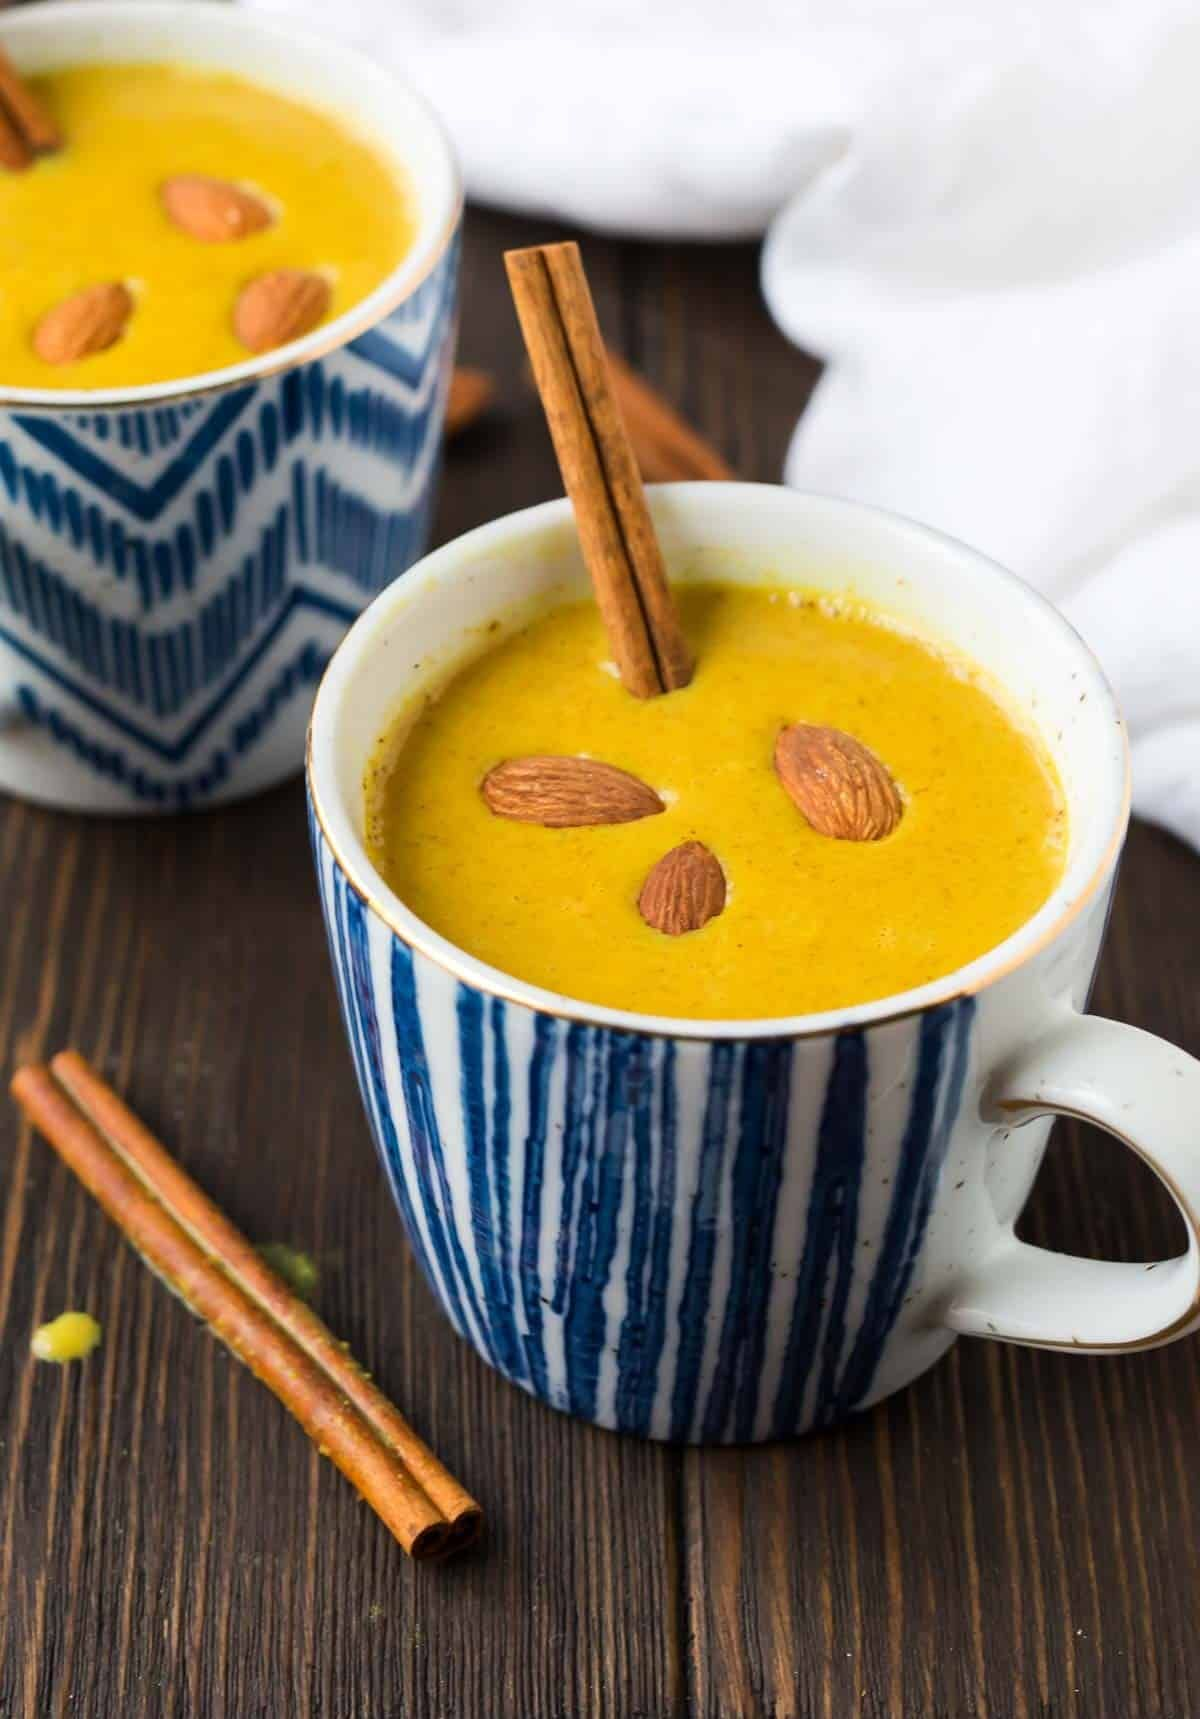 soothing bedtime cinnamon golden milk. a warm, vegan drink to help